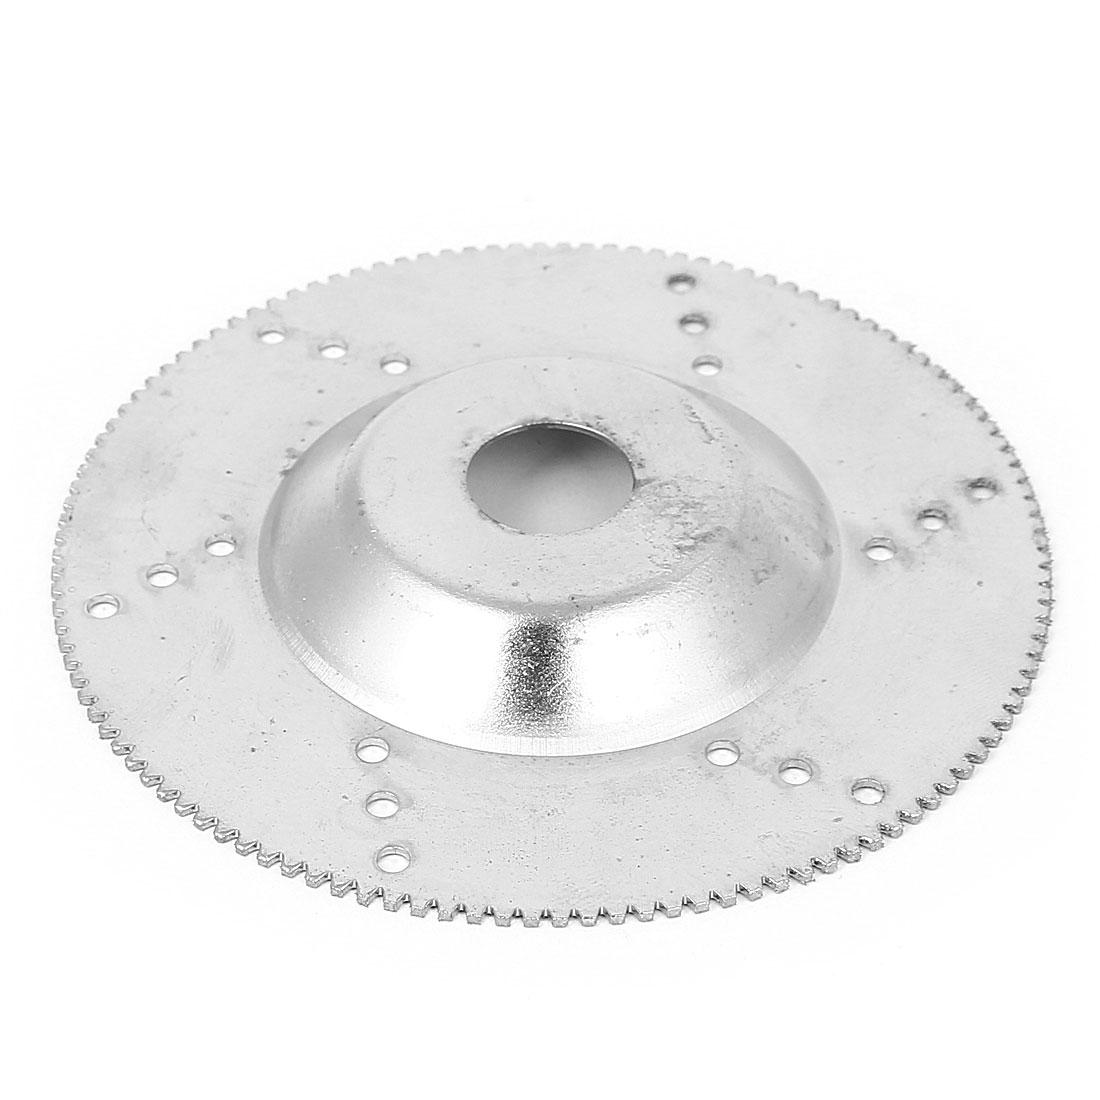 100mm x 16mm Diamond Coated Jewelry Grinding Polishing Disc Wheel Silver Tone